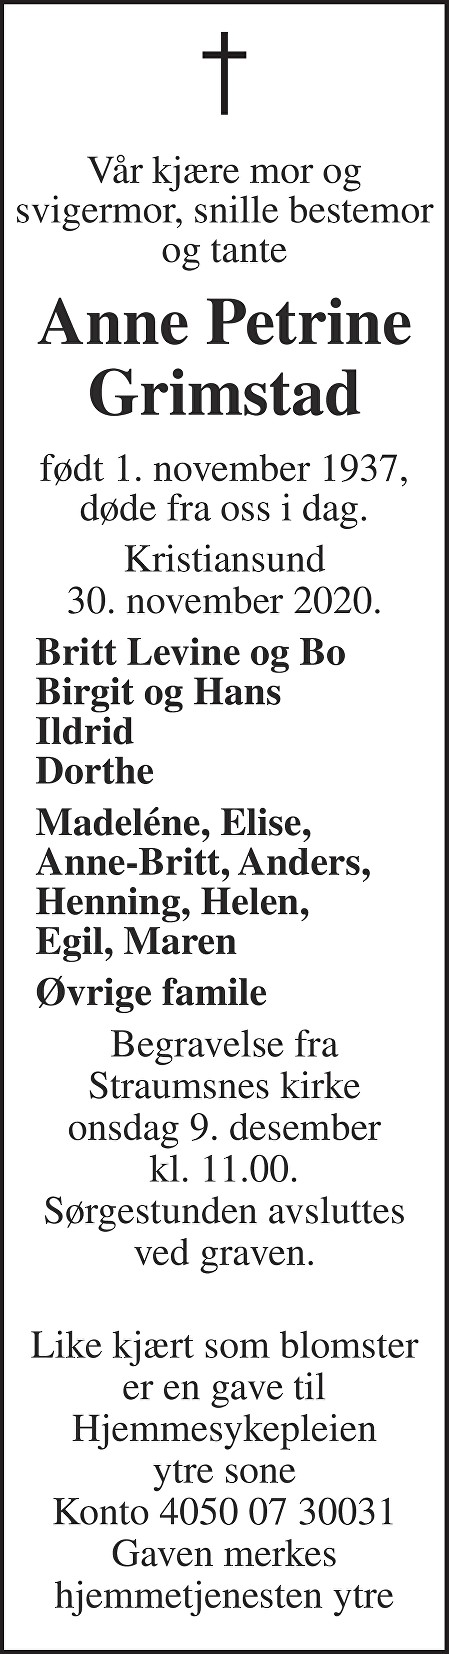 Anne Petrine Grimstad Dødsannonse